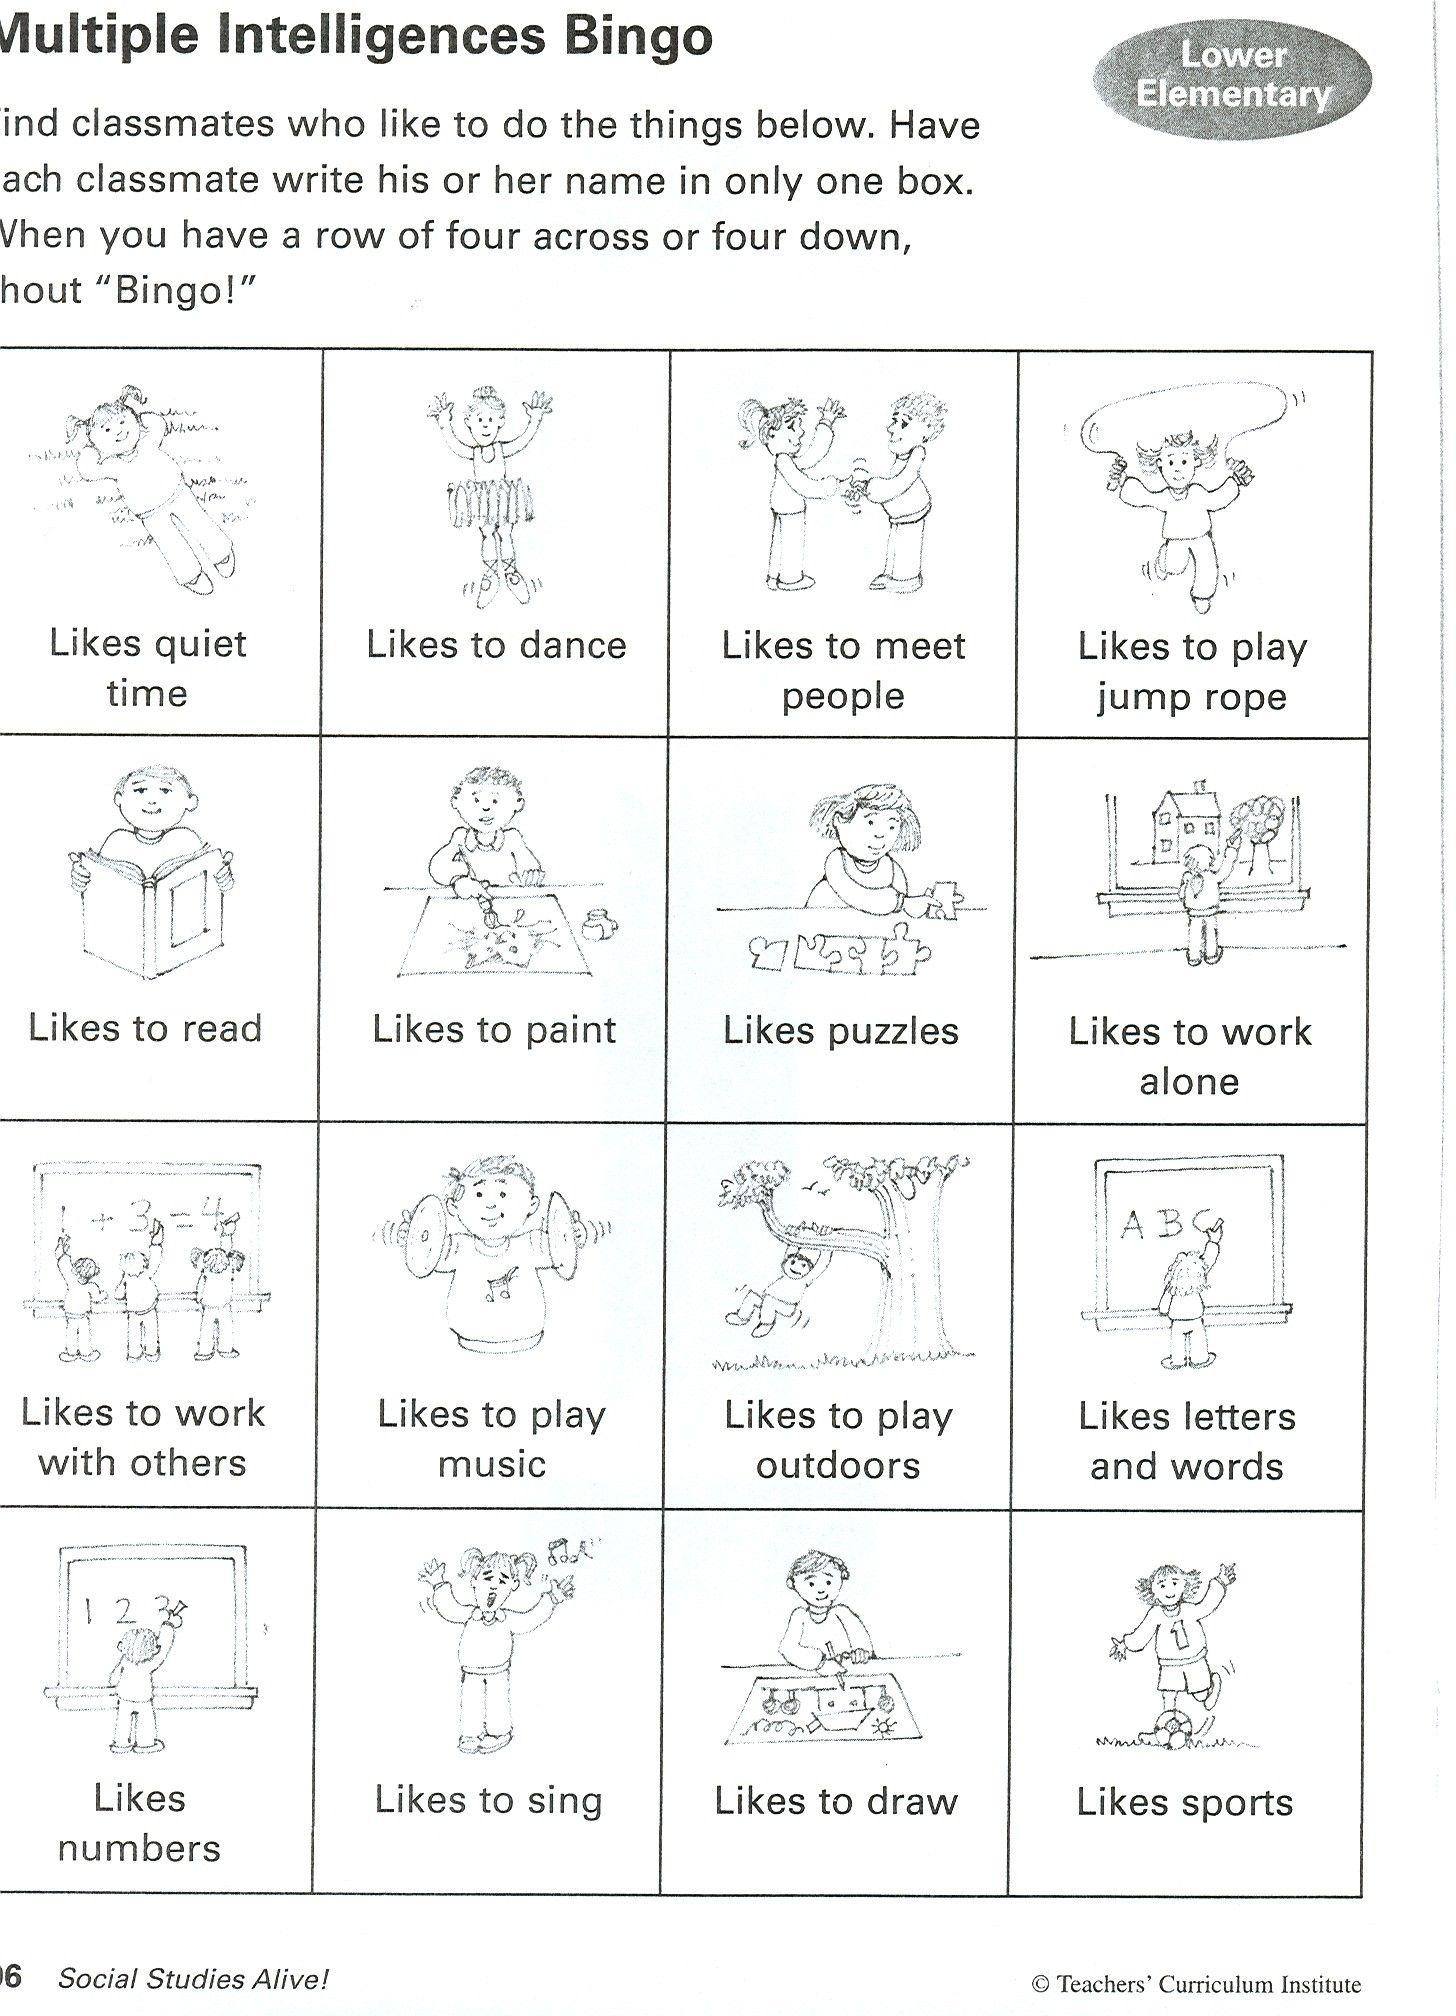 8 Intelligences Activities